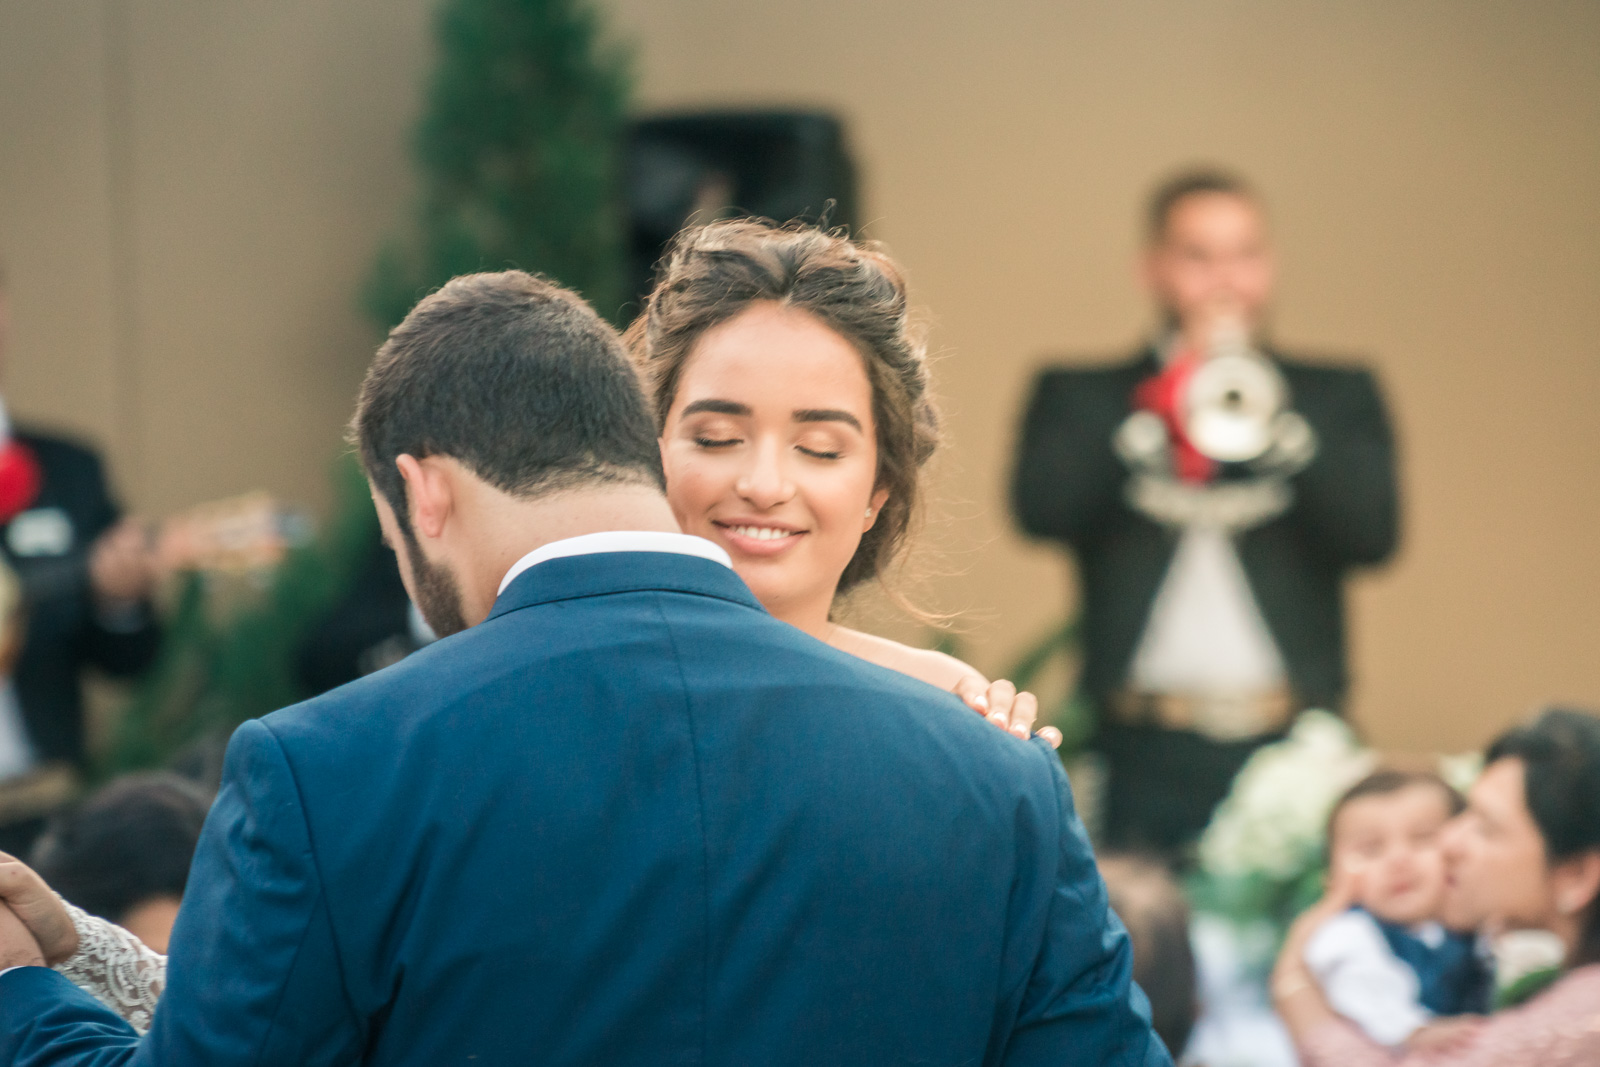 353_Angel-Brea-Orange-County_Joseph-Barber-Wedding-Photography.jpg